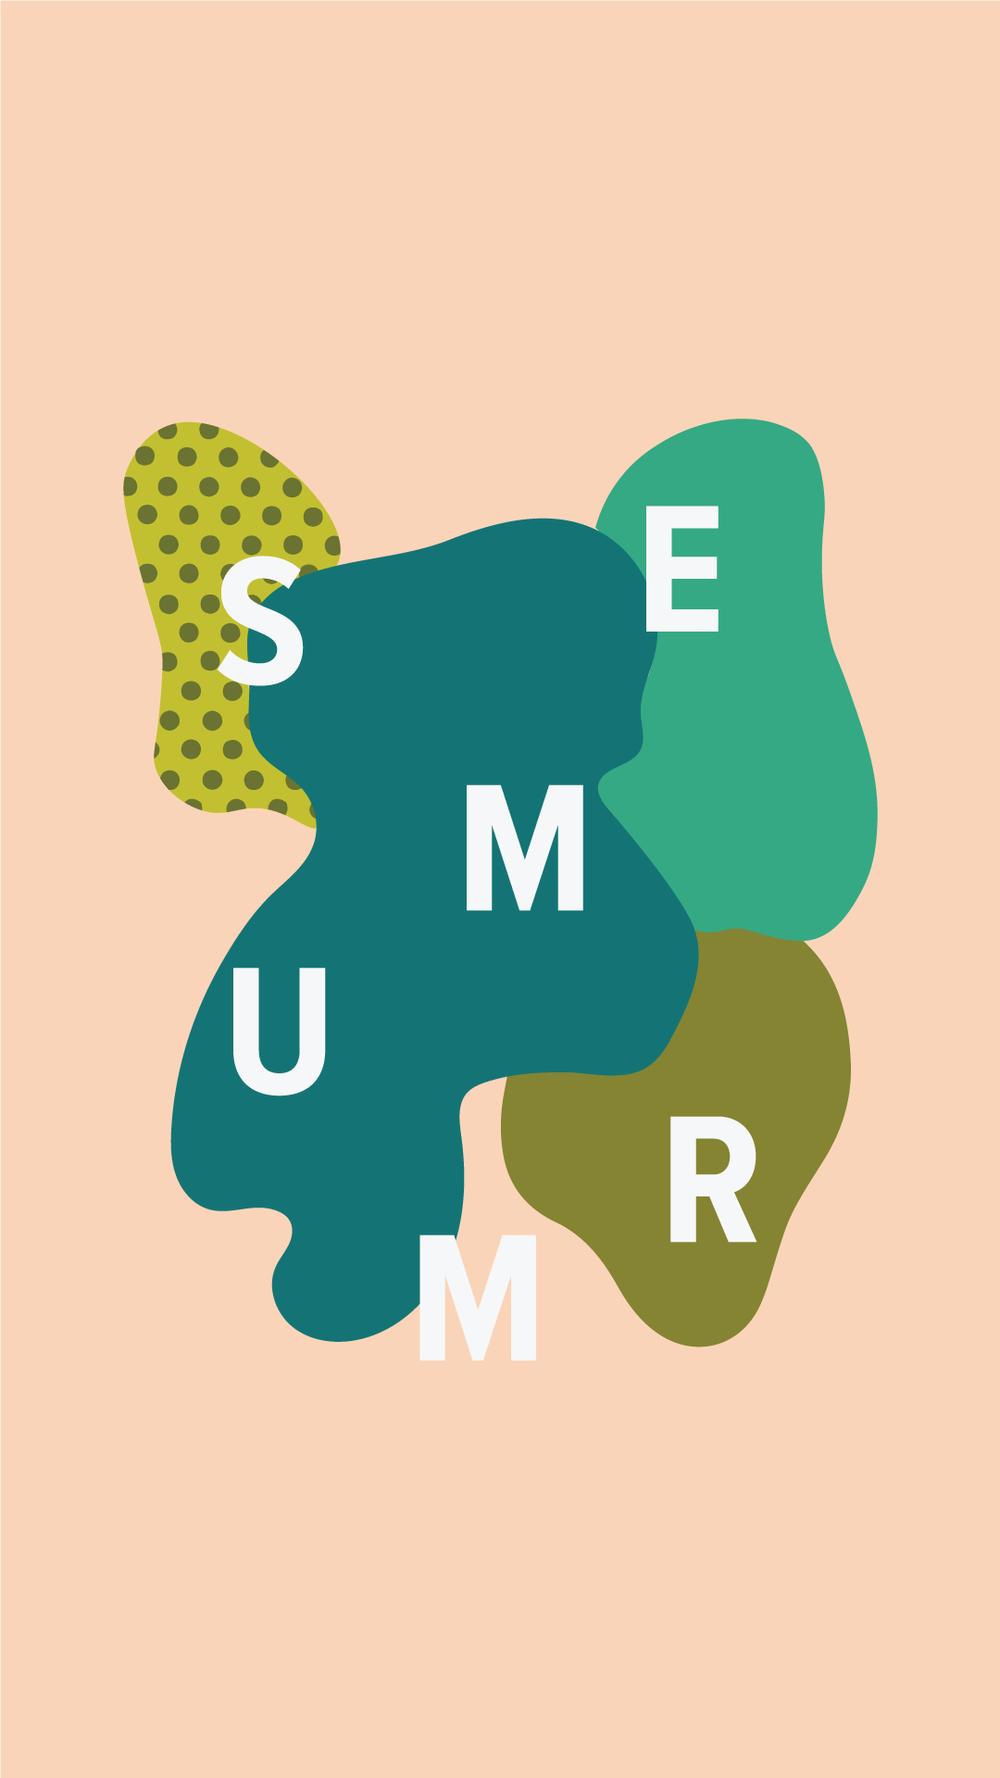 Summer-Promo-IG-Story-1.png